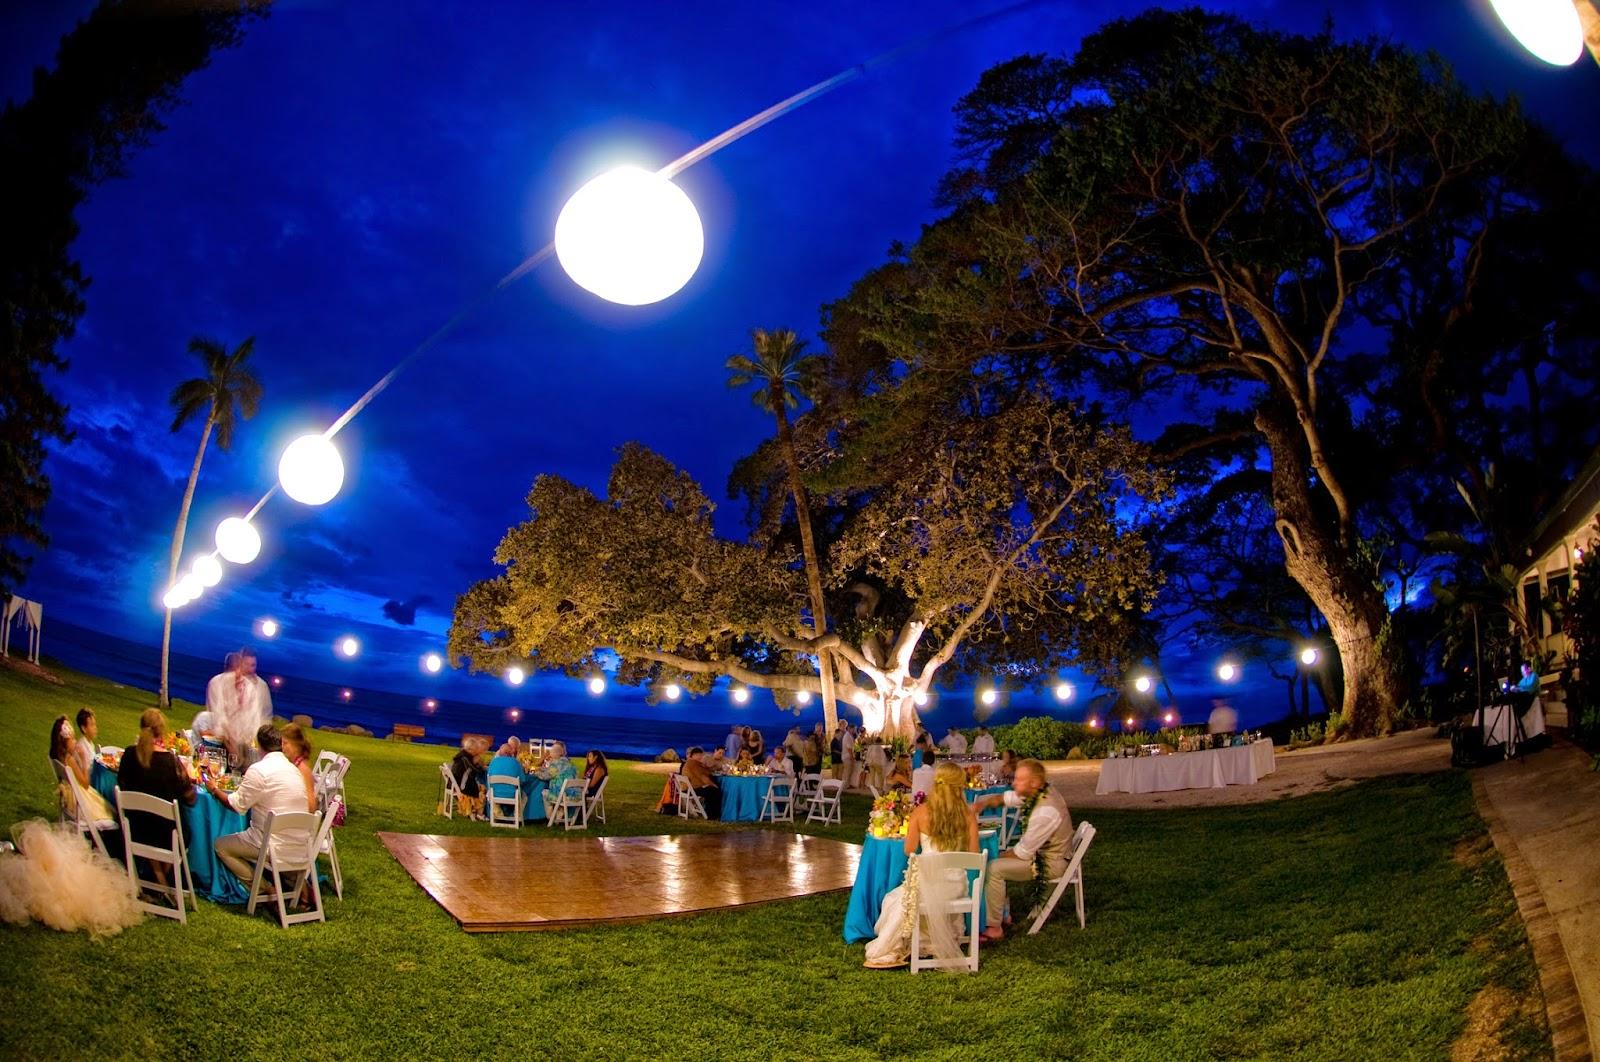 maui wedding locations, maui provate wedding venue, maui wedding photographers, maui wedding planners